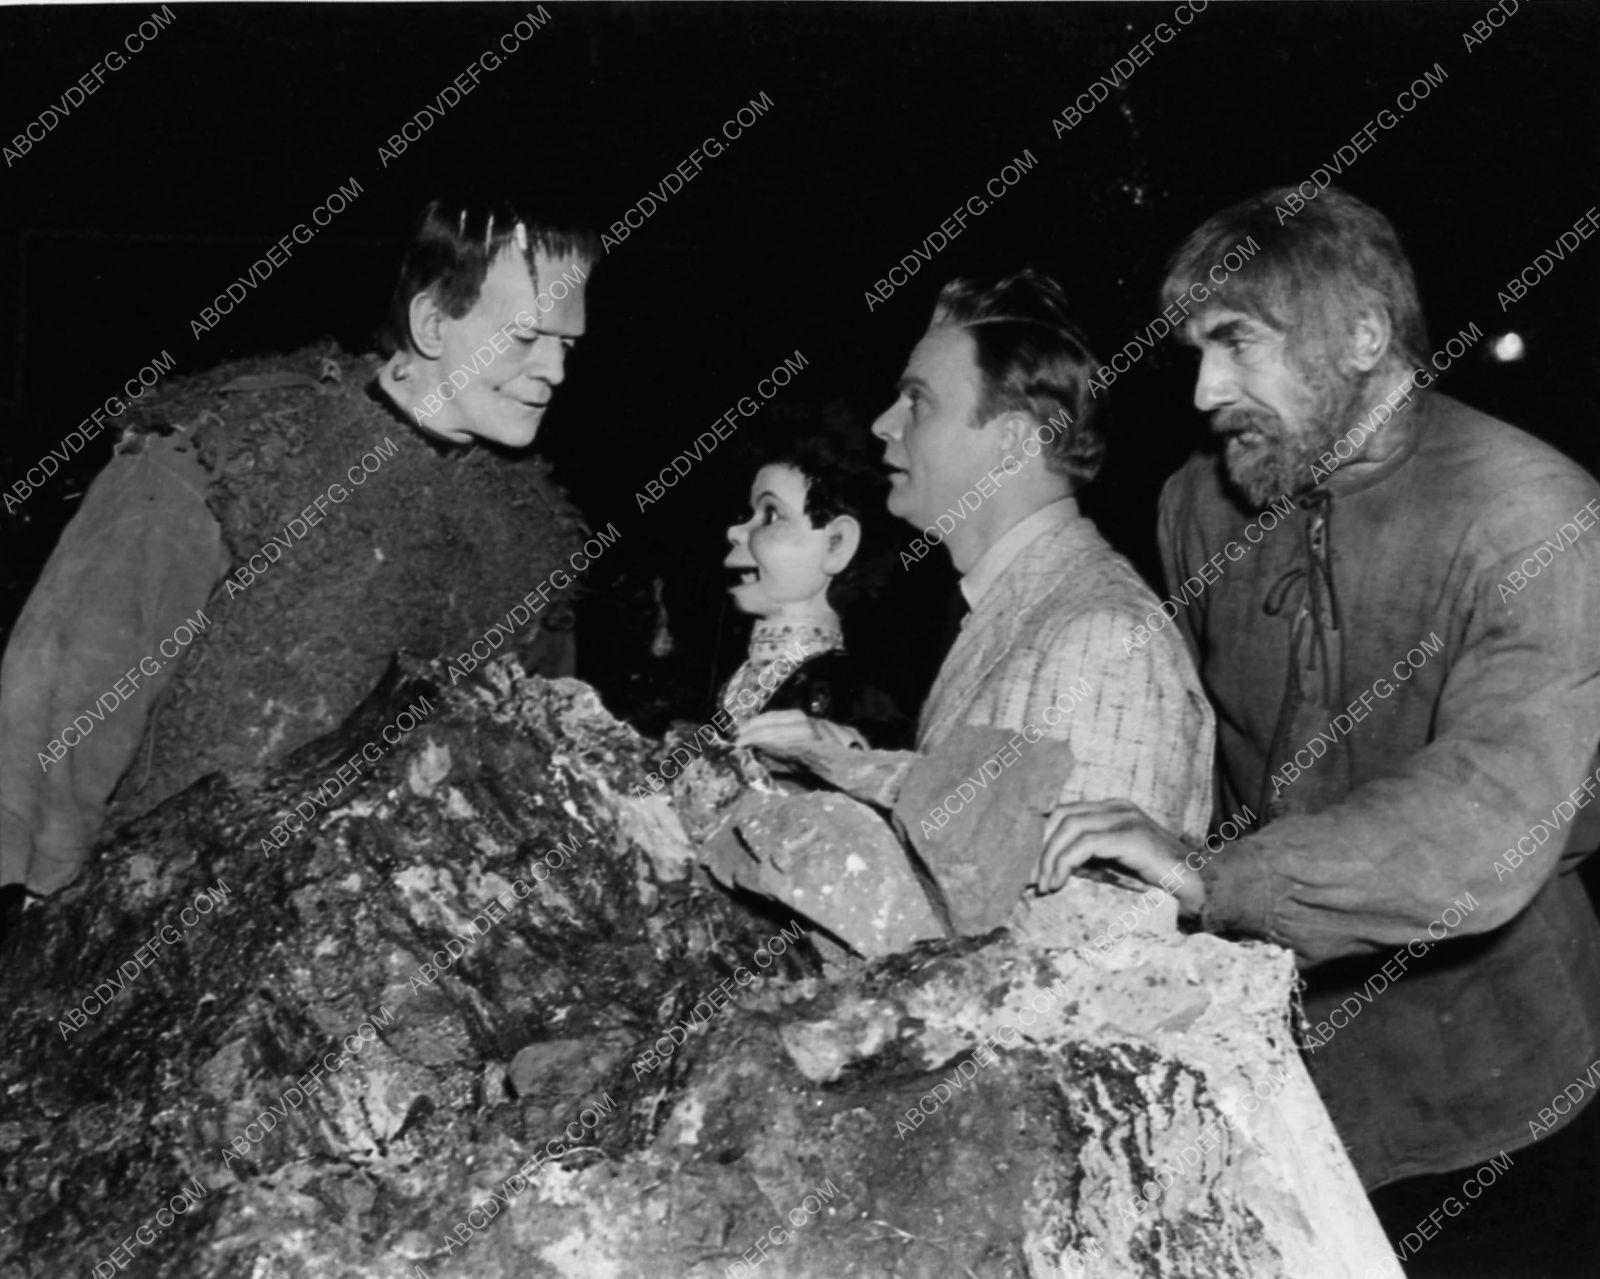 Edger Bergen Charlie McCarthy Visit Boris Karloff Bela Lugosi - 14 behind scenes photographs